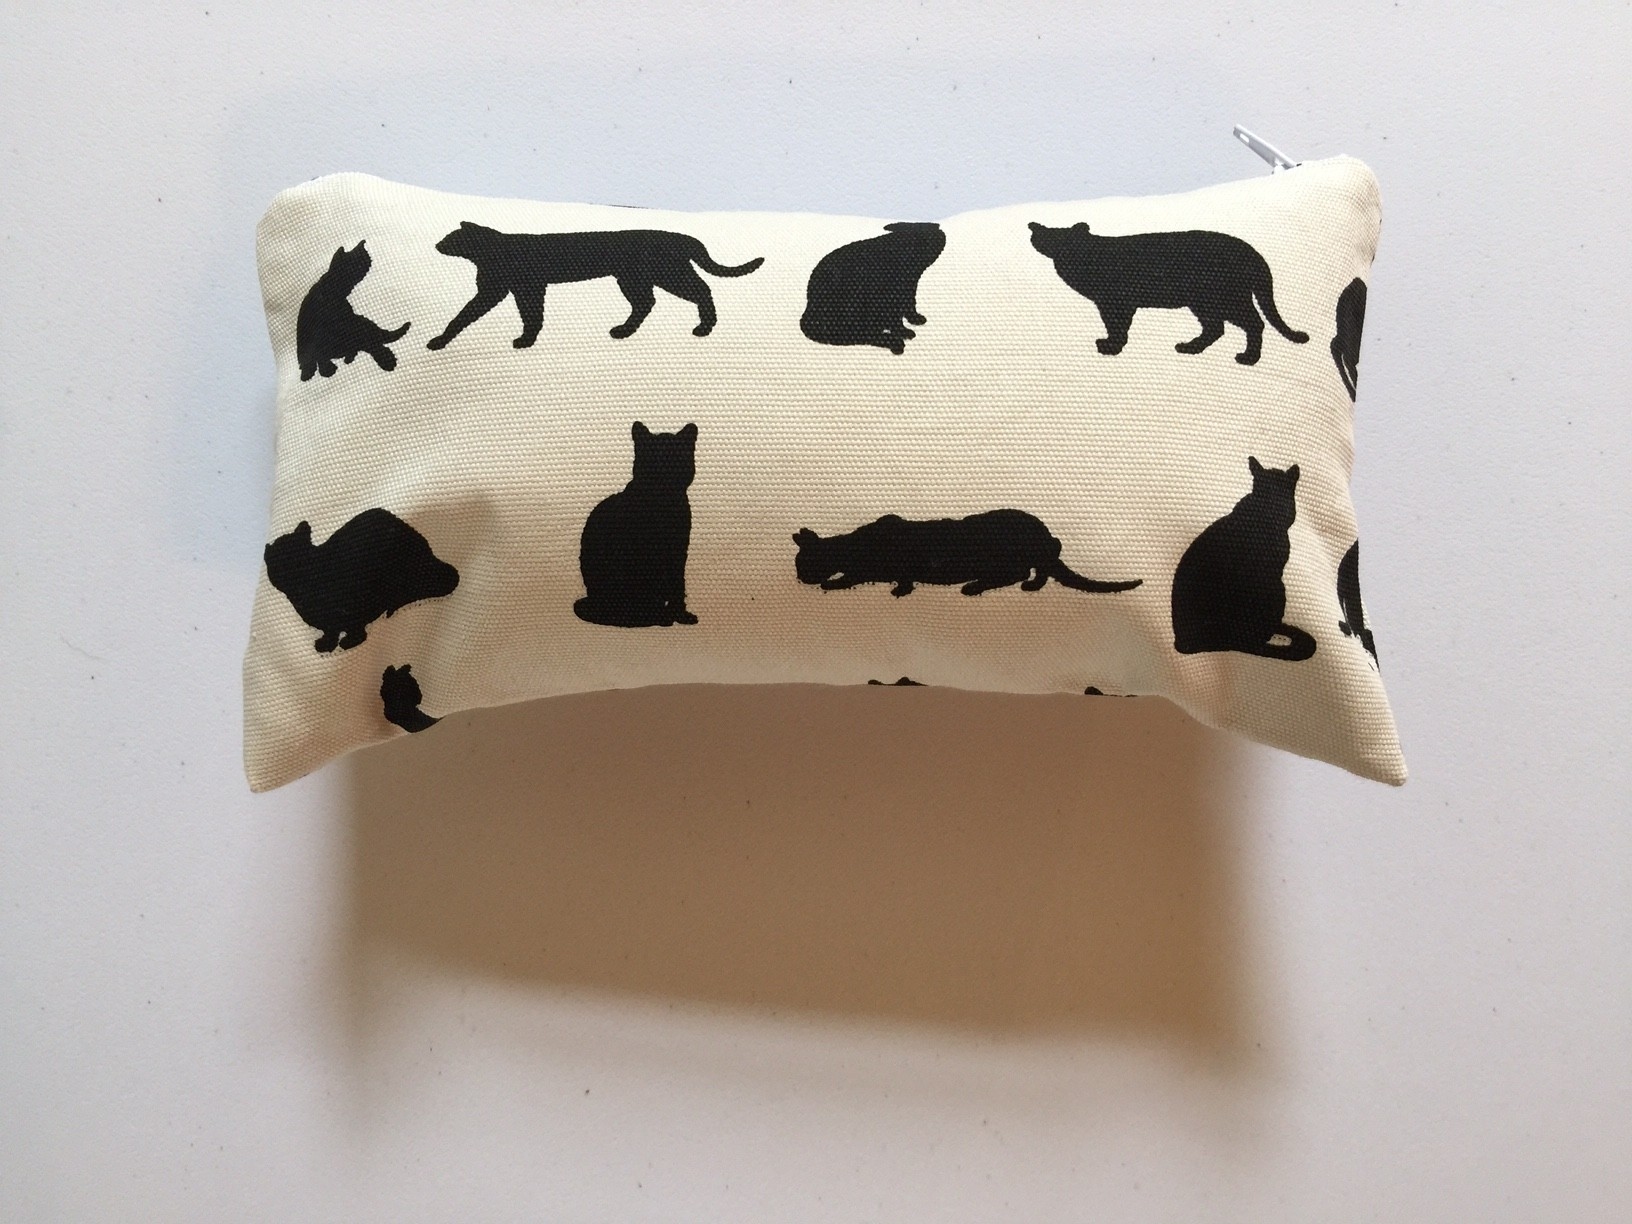 Small bag - Cat design